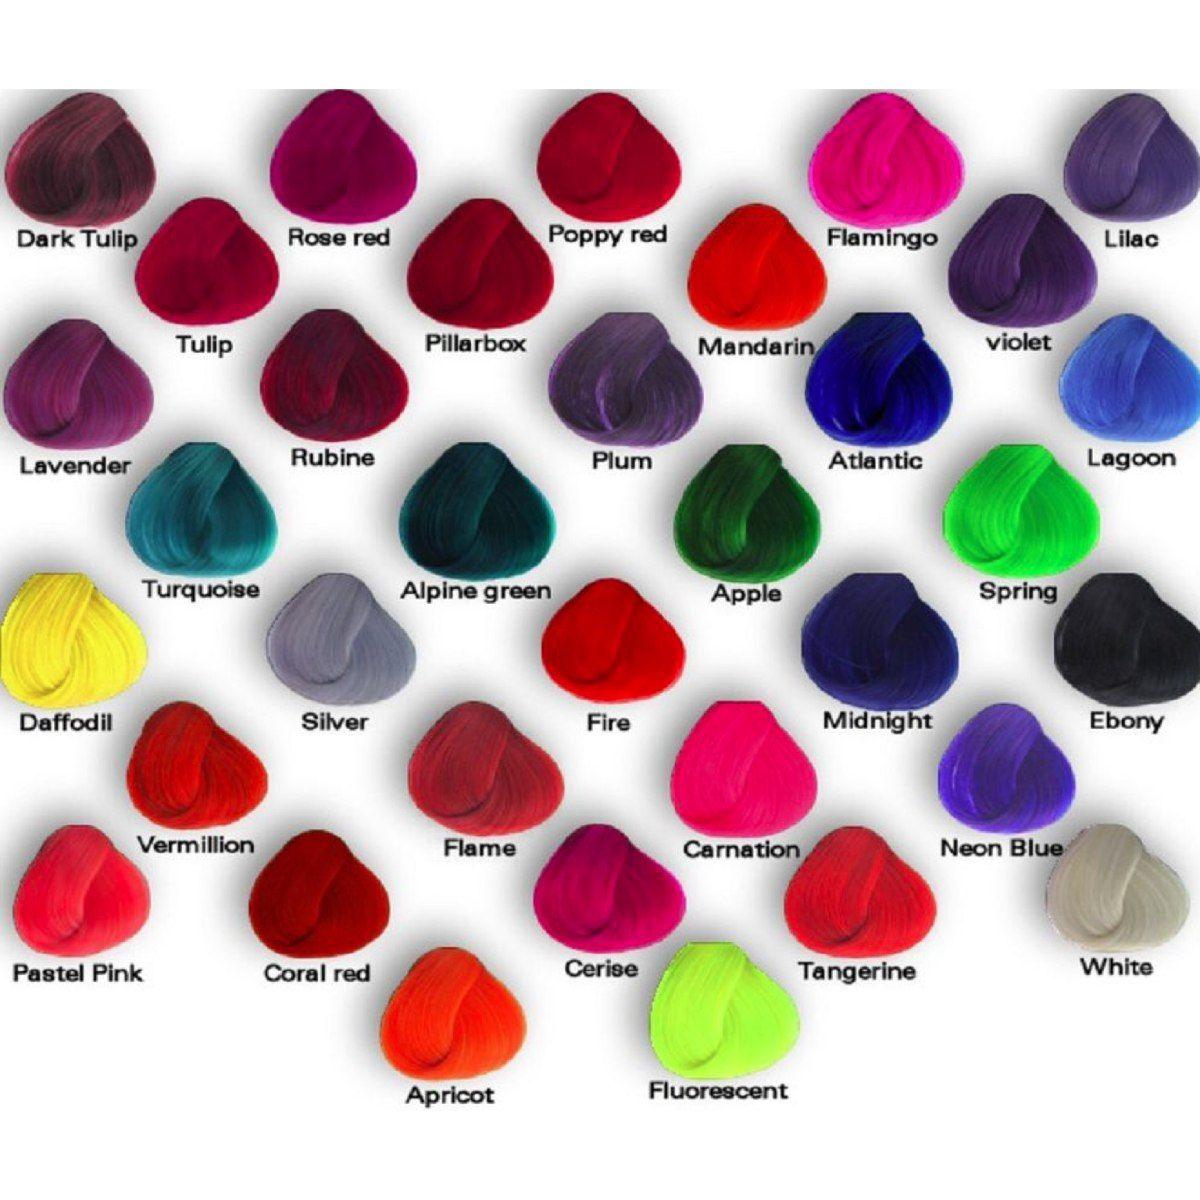 Directions hair colour tinte fantasia ahora en colombia 491701 pravana chromasilk vivids hair color chart dfemale beauty tips nvjuhfo Images